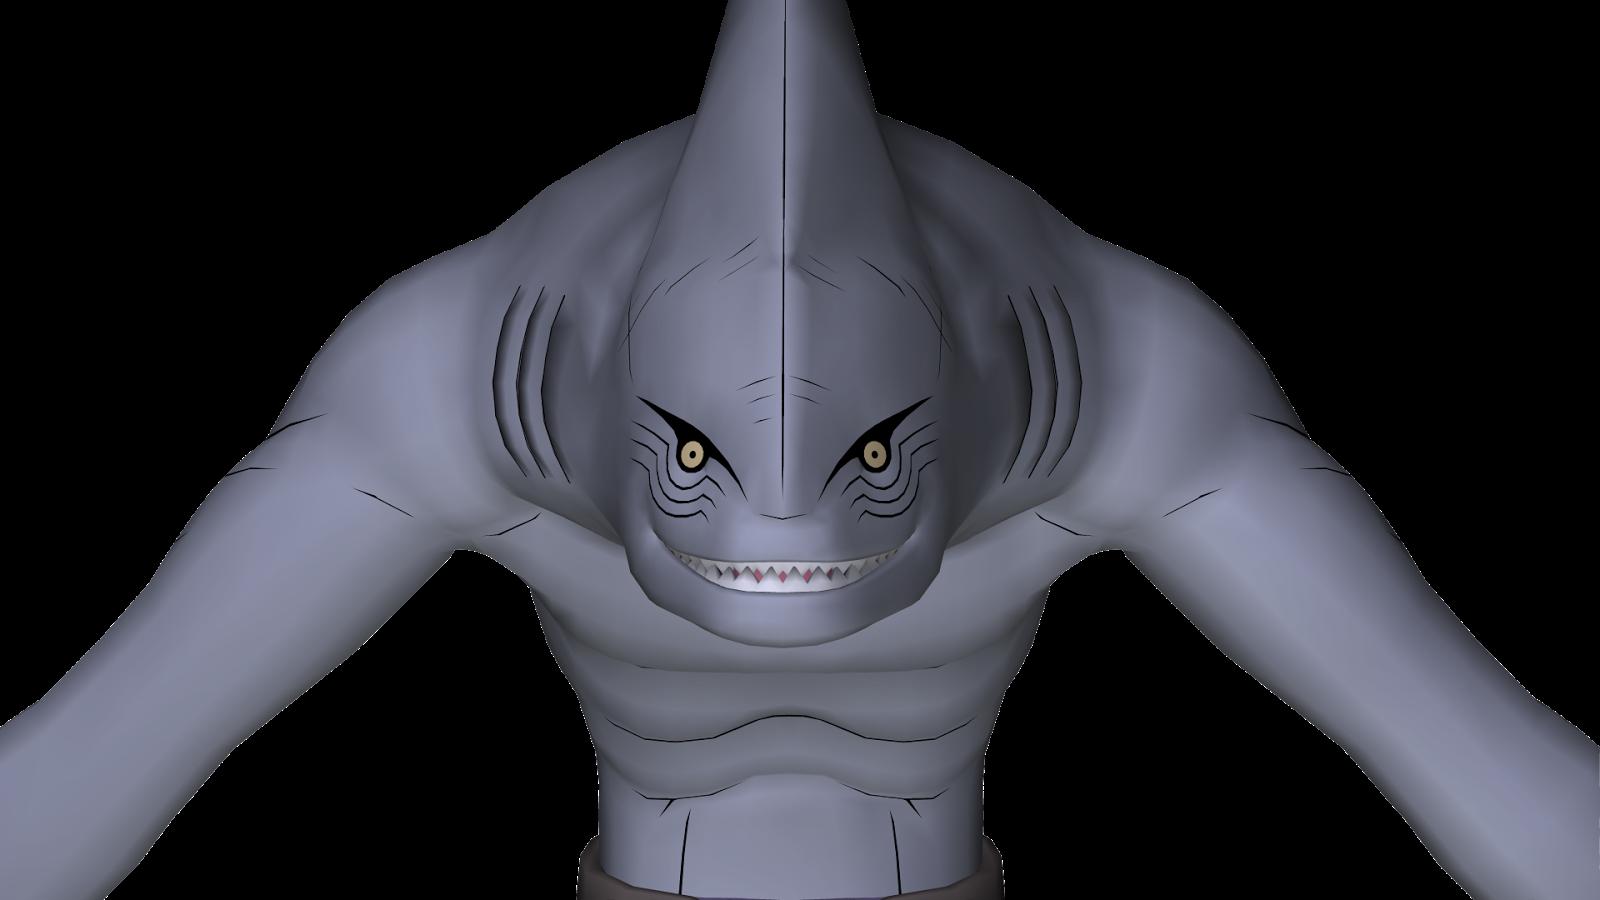 Kisame Hoshigaki Shark Form 21319 | ZSOURCE